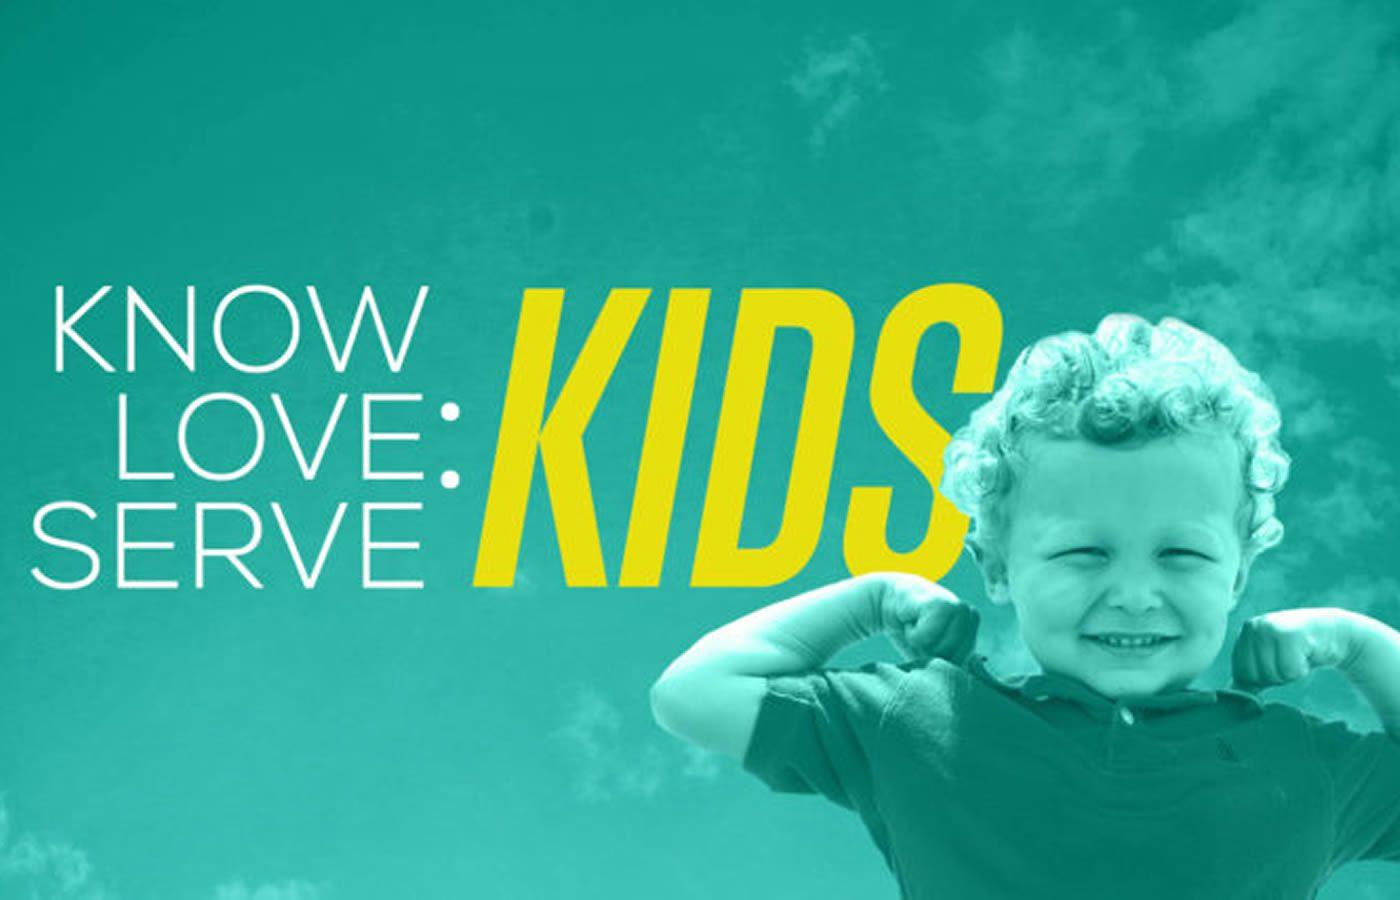 Know, Love, Serve … Kids (Part 2 of 5)